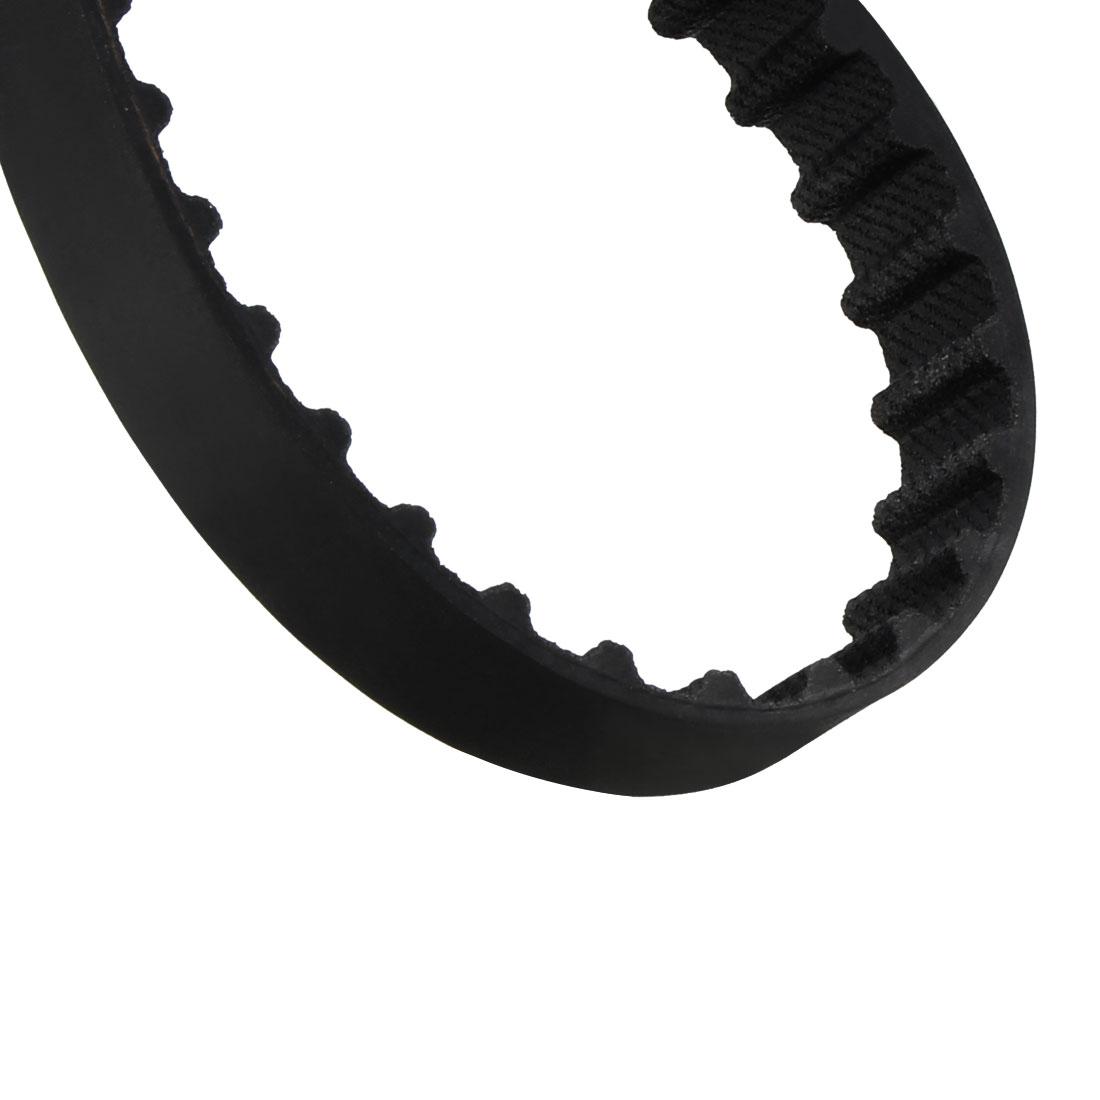 76XL 38 Teeth 10mm x 5.08mm Rubber Timing Geared Belt for Stepper Motor Black